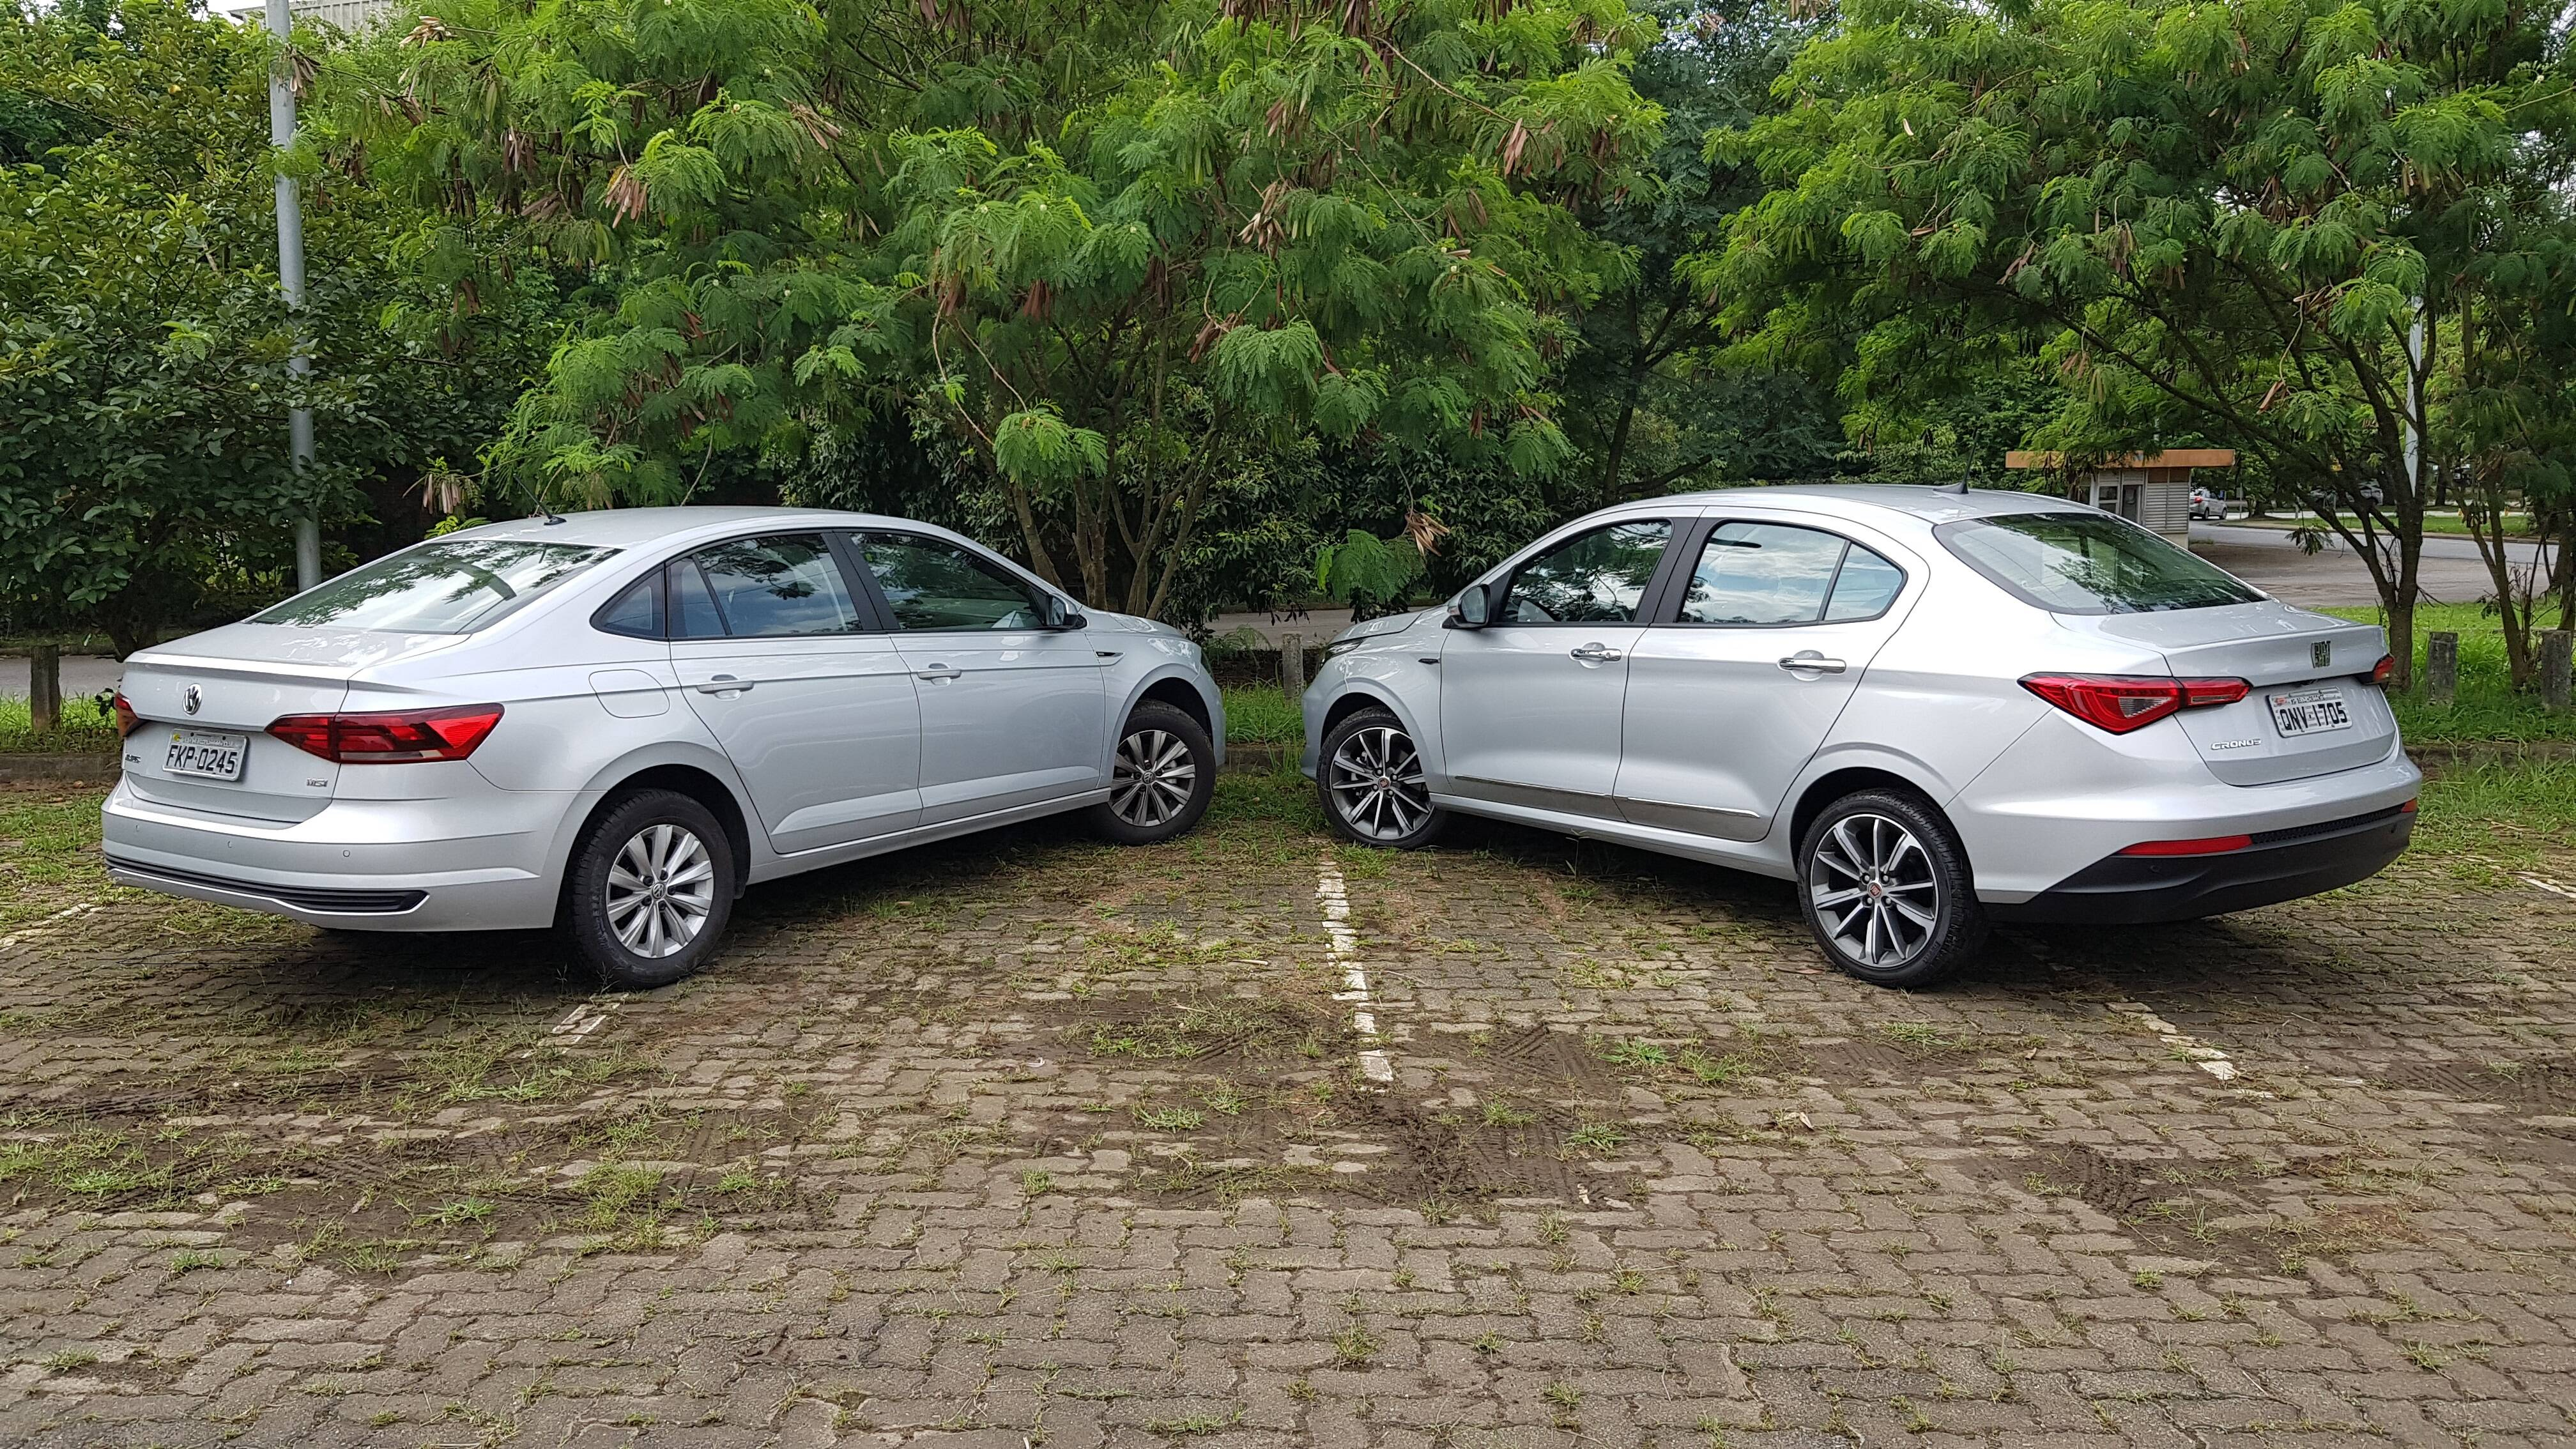 Fiat Cronos e VW Virtus. Foto: Caue Lira/iG